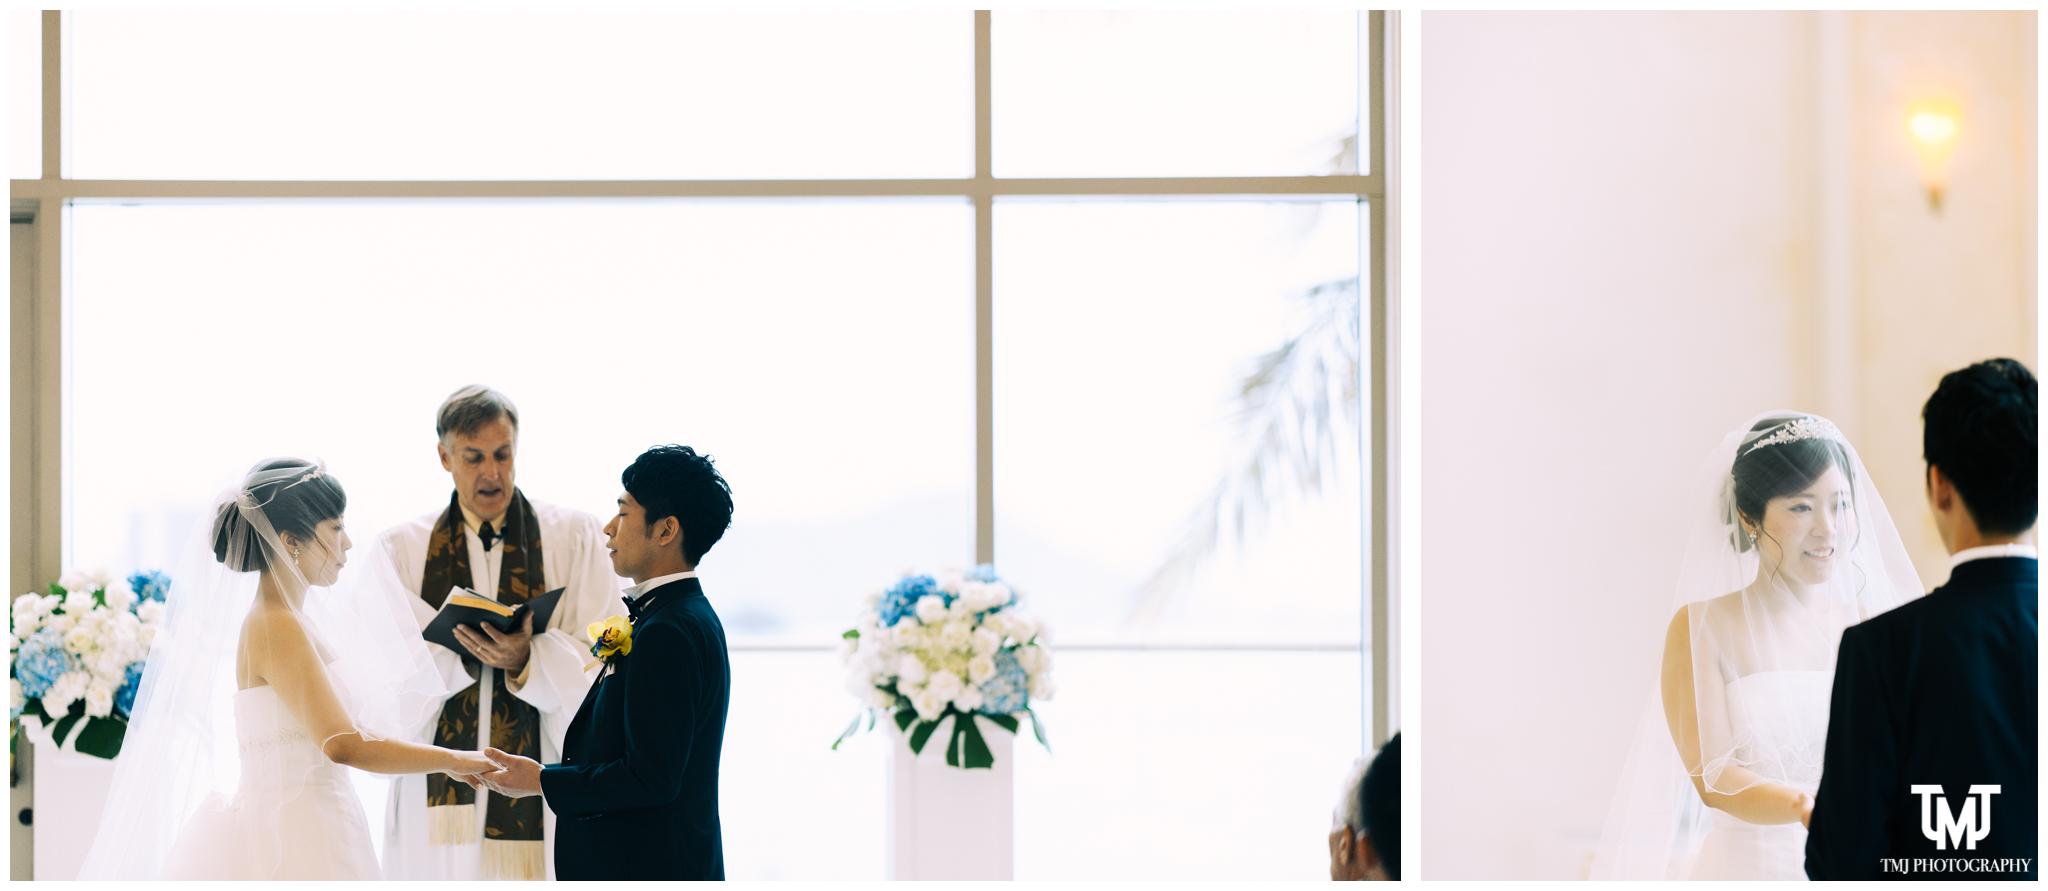 Moana Surfrider Terrace By The Sea Honolulu Destination Wedding 038.jpg